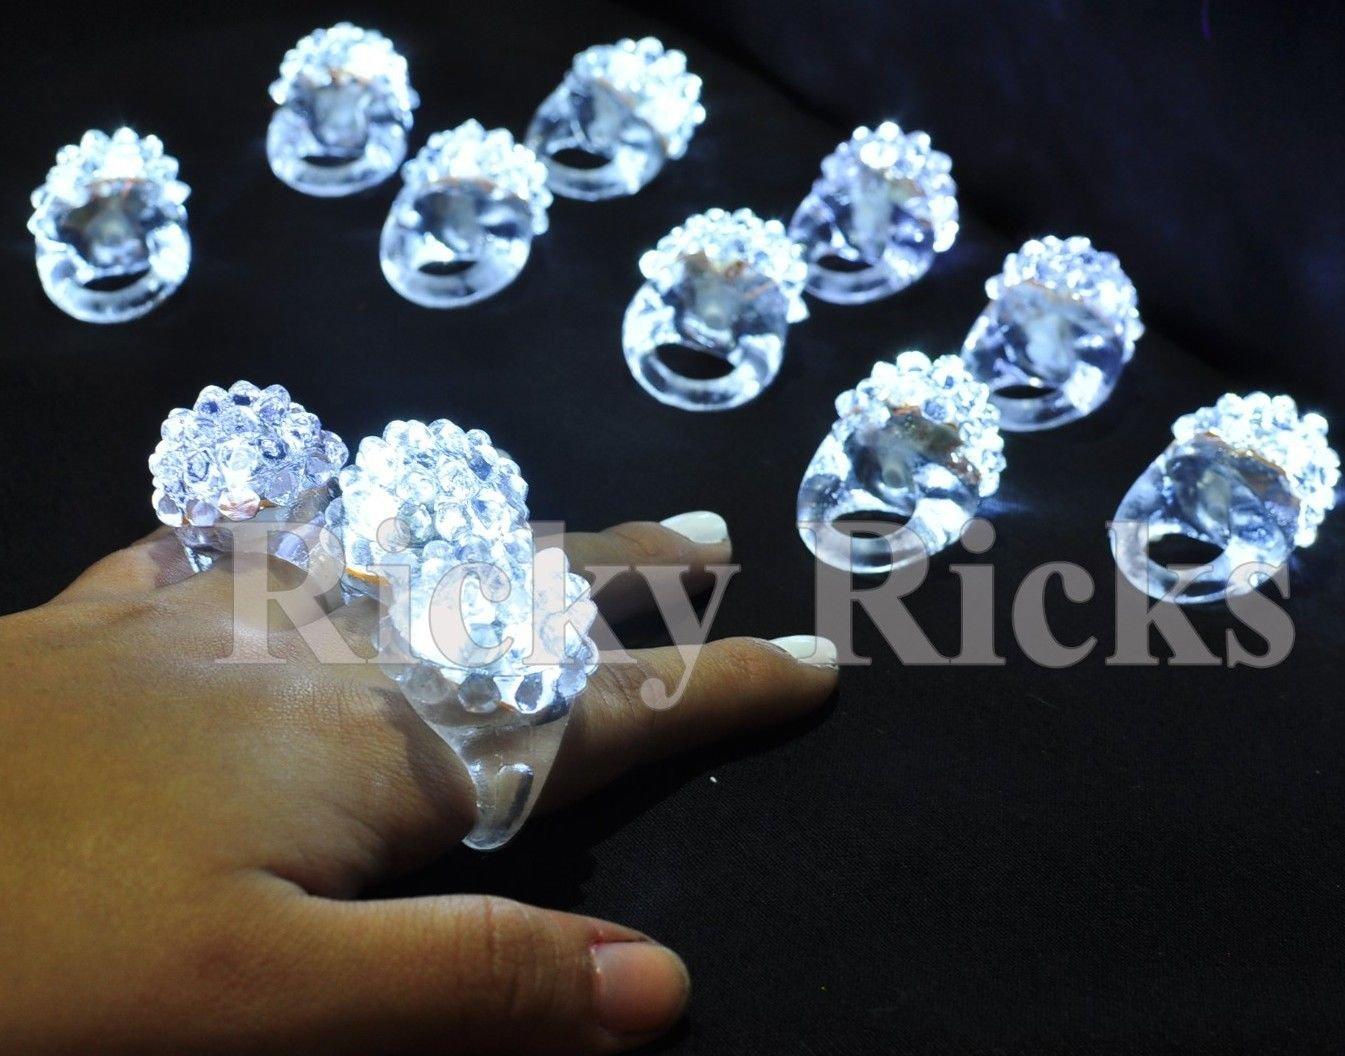 VirtualSurround 100 Pack Light-Up White Jelly Bumpy Rings Flashing LED Bubble Rave Favors